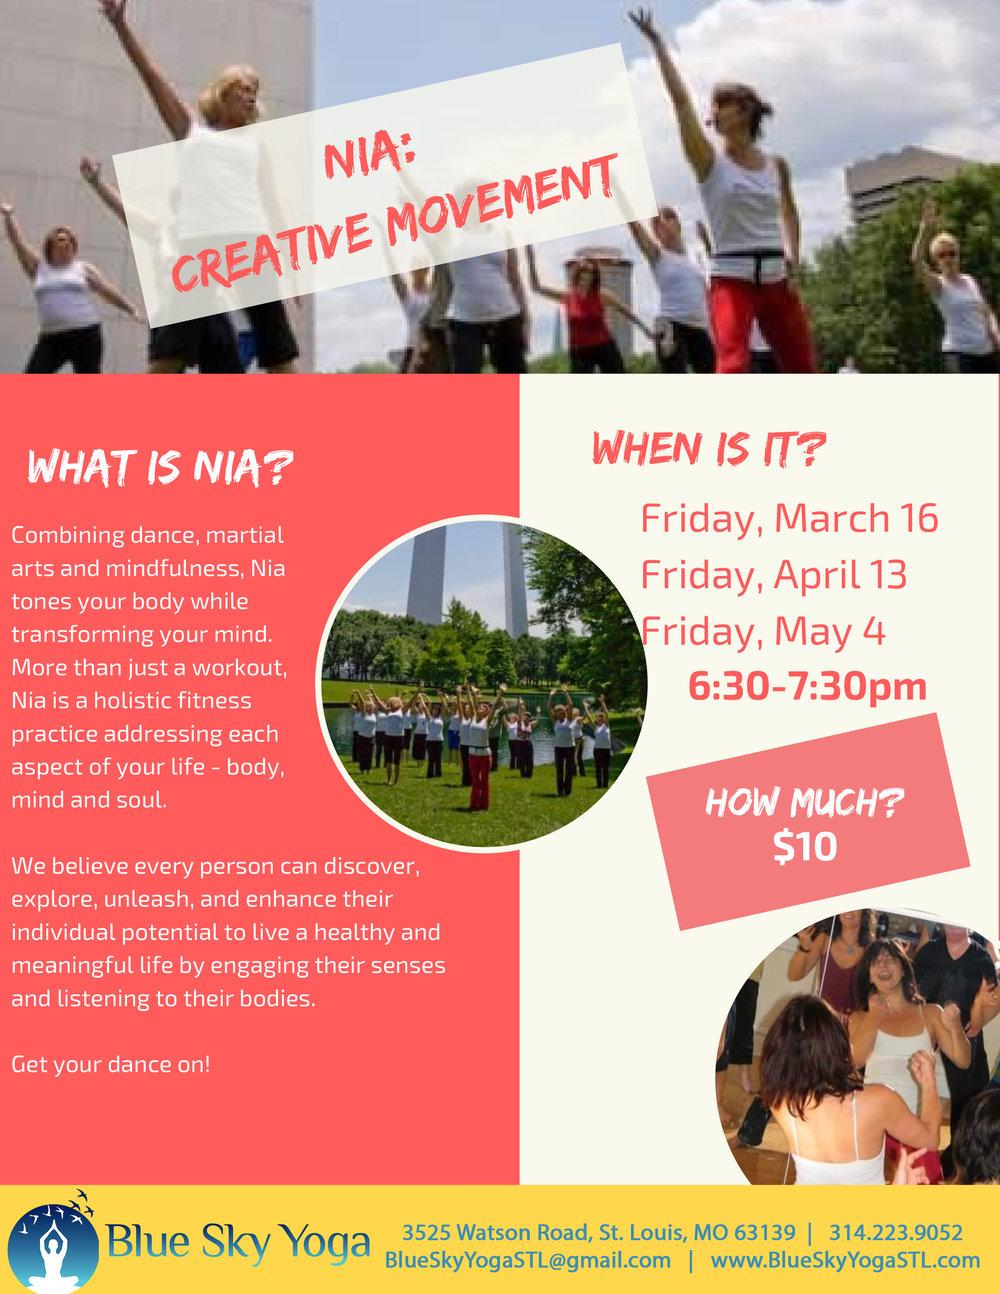 Copy of Nia: Creative Movement